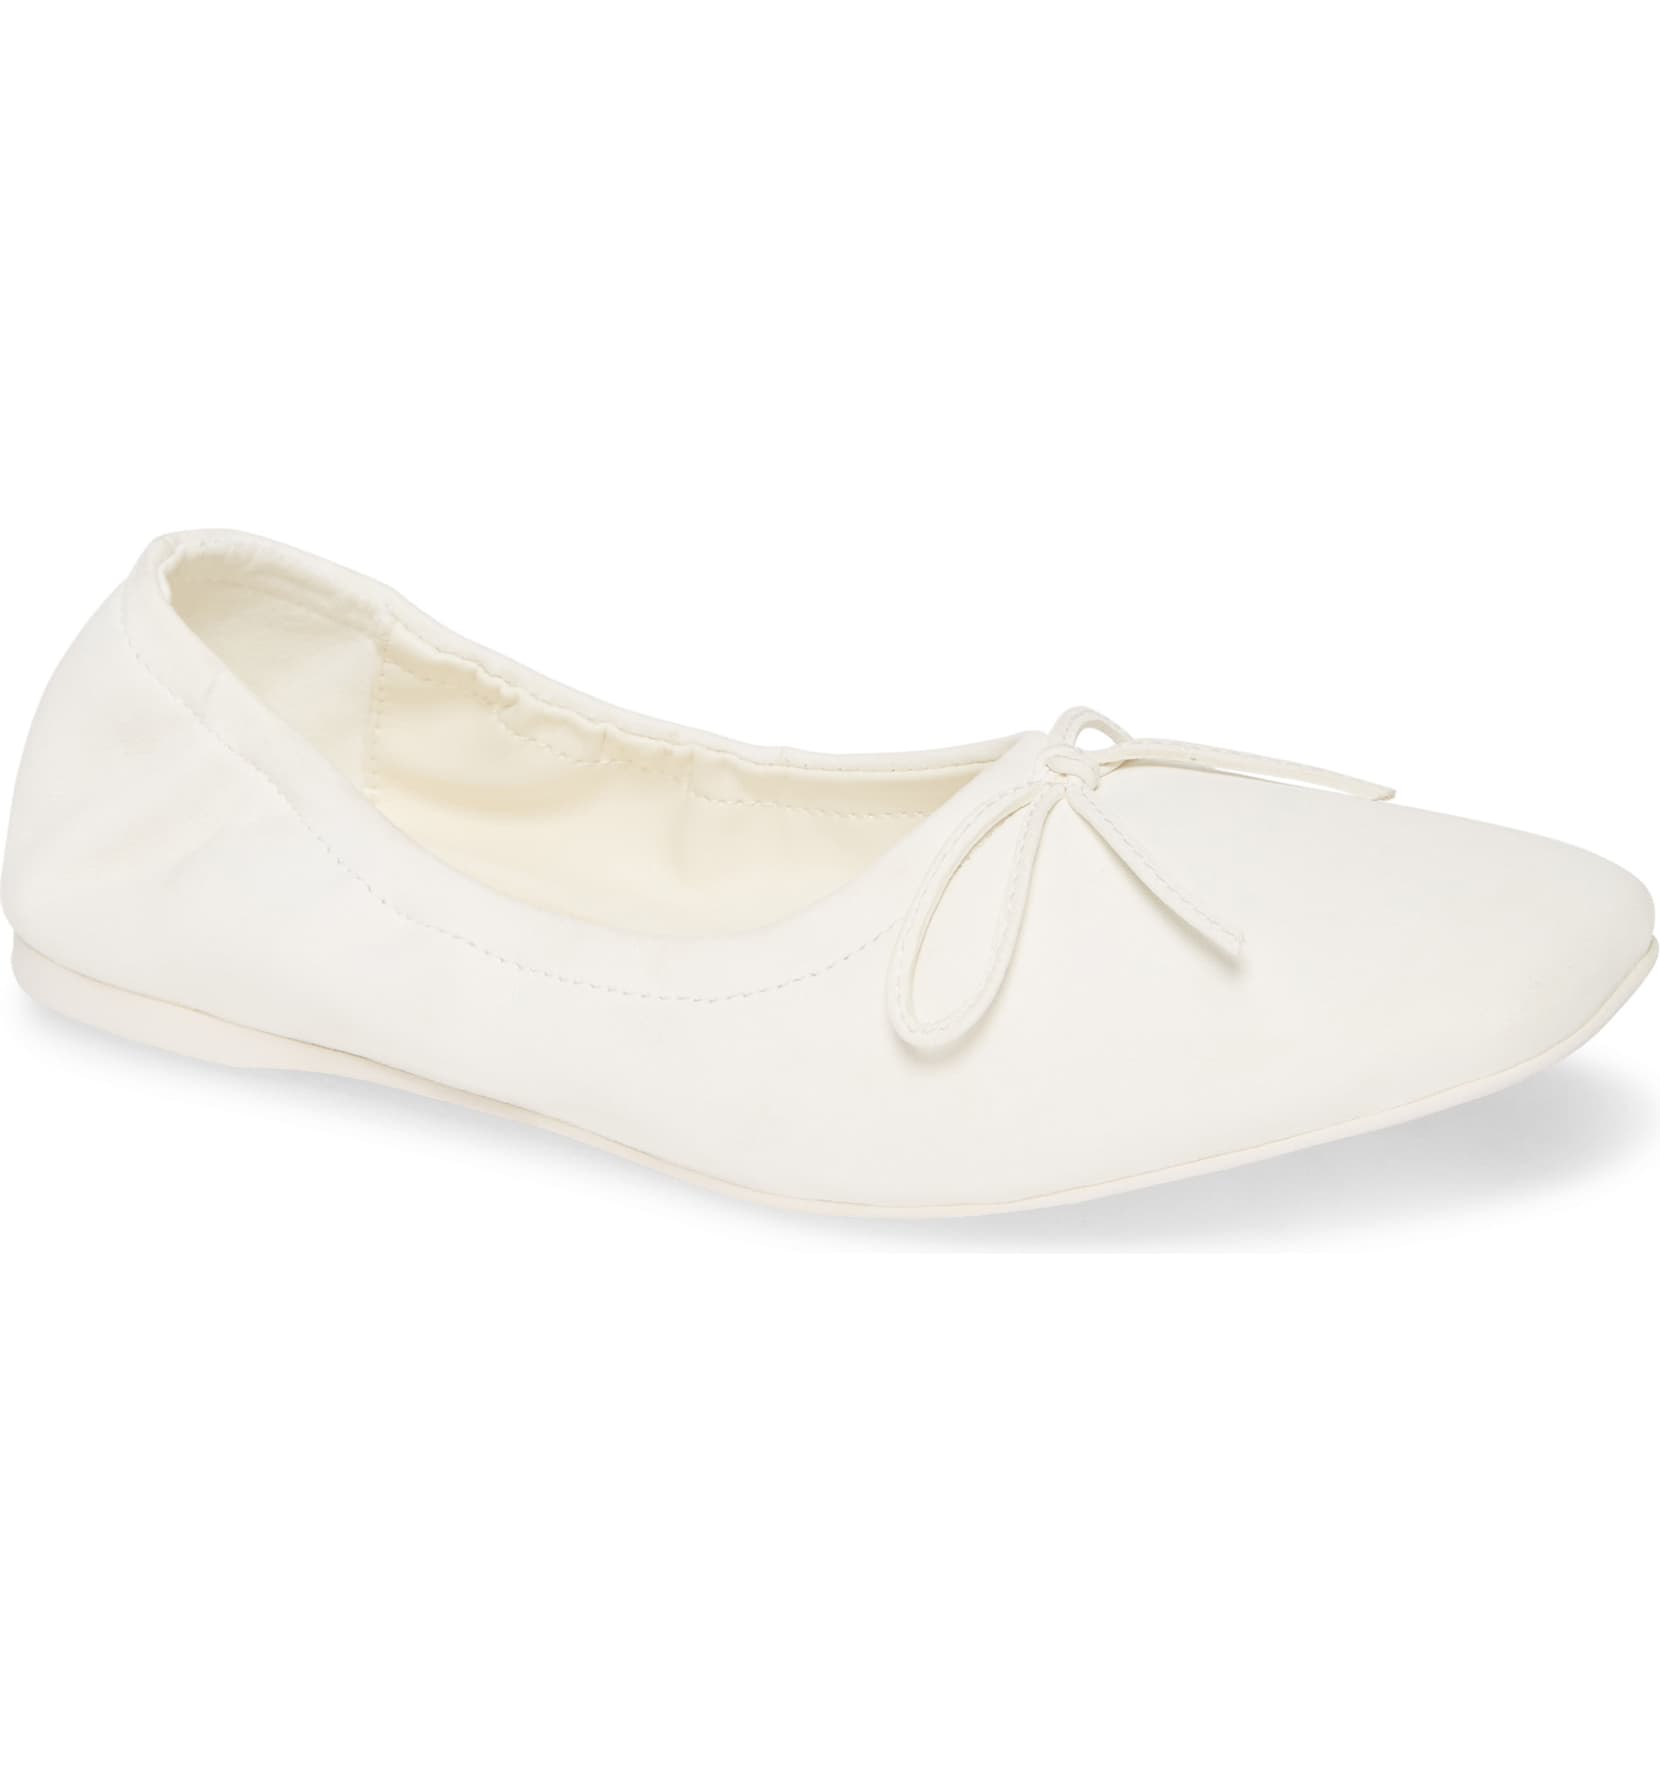 Jeffrey Campbell Ballet Flat